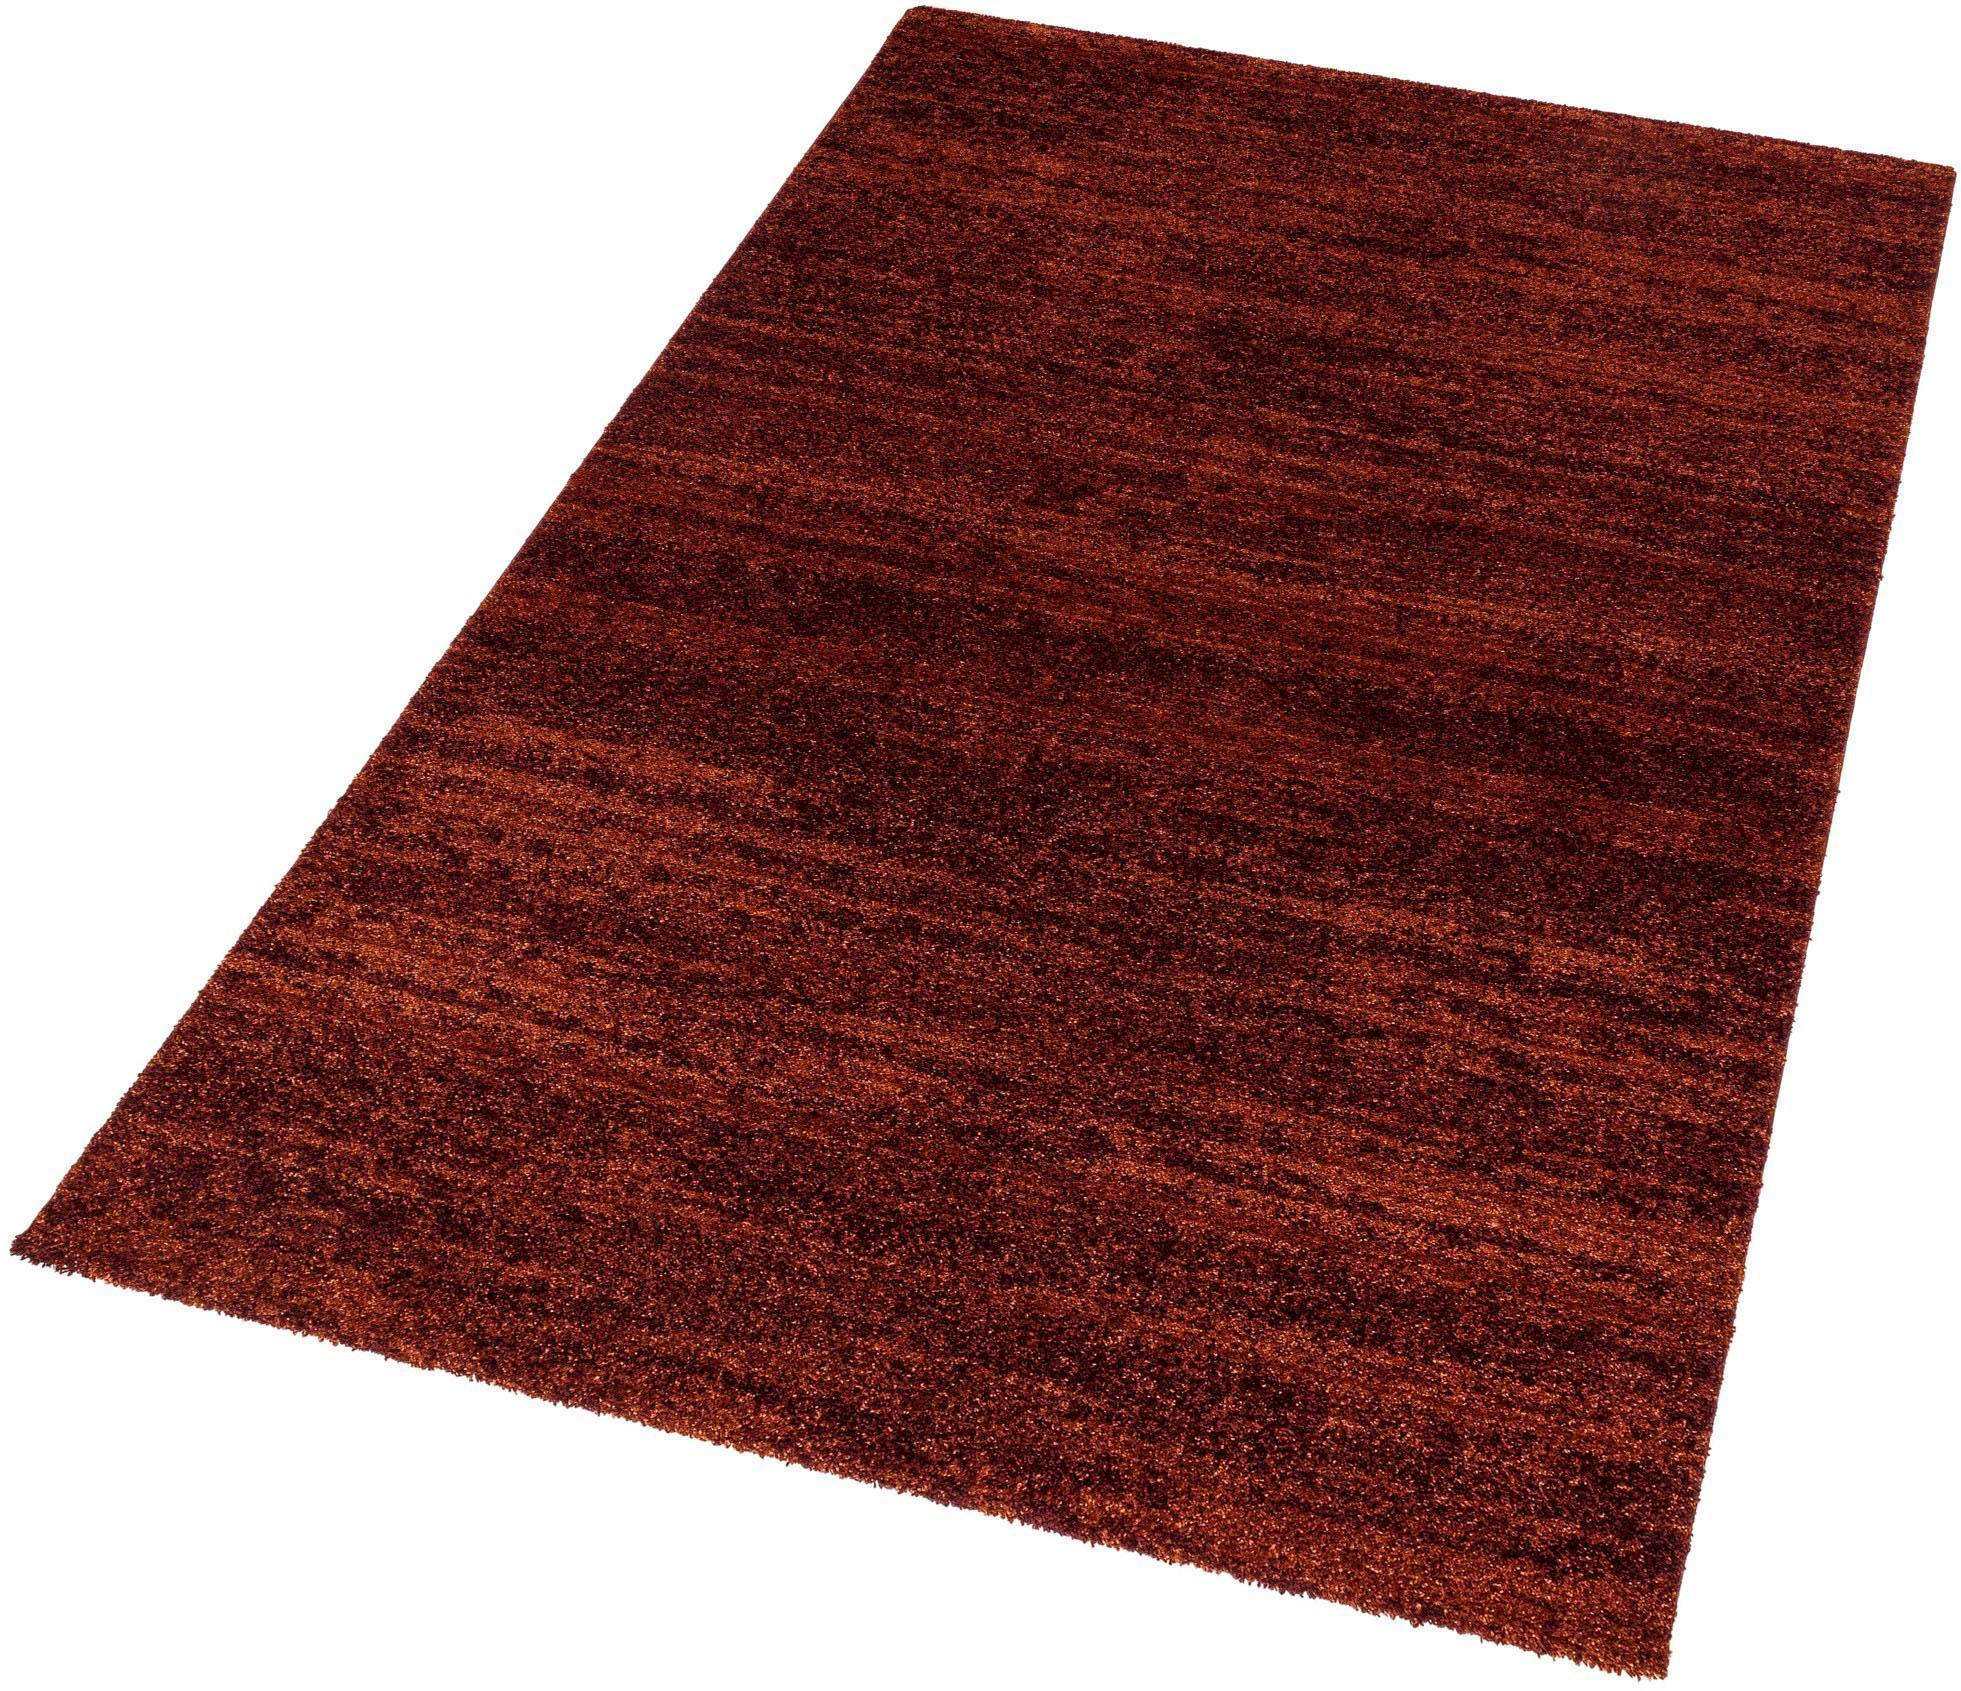 Teppich Samoa Melange ASTRA rechteckig Höhe 20 mm maschinell gewebt